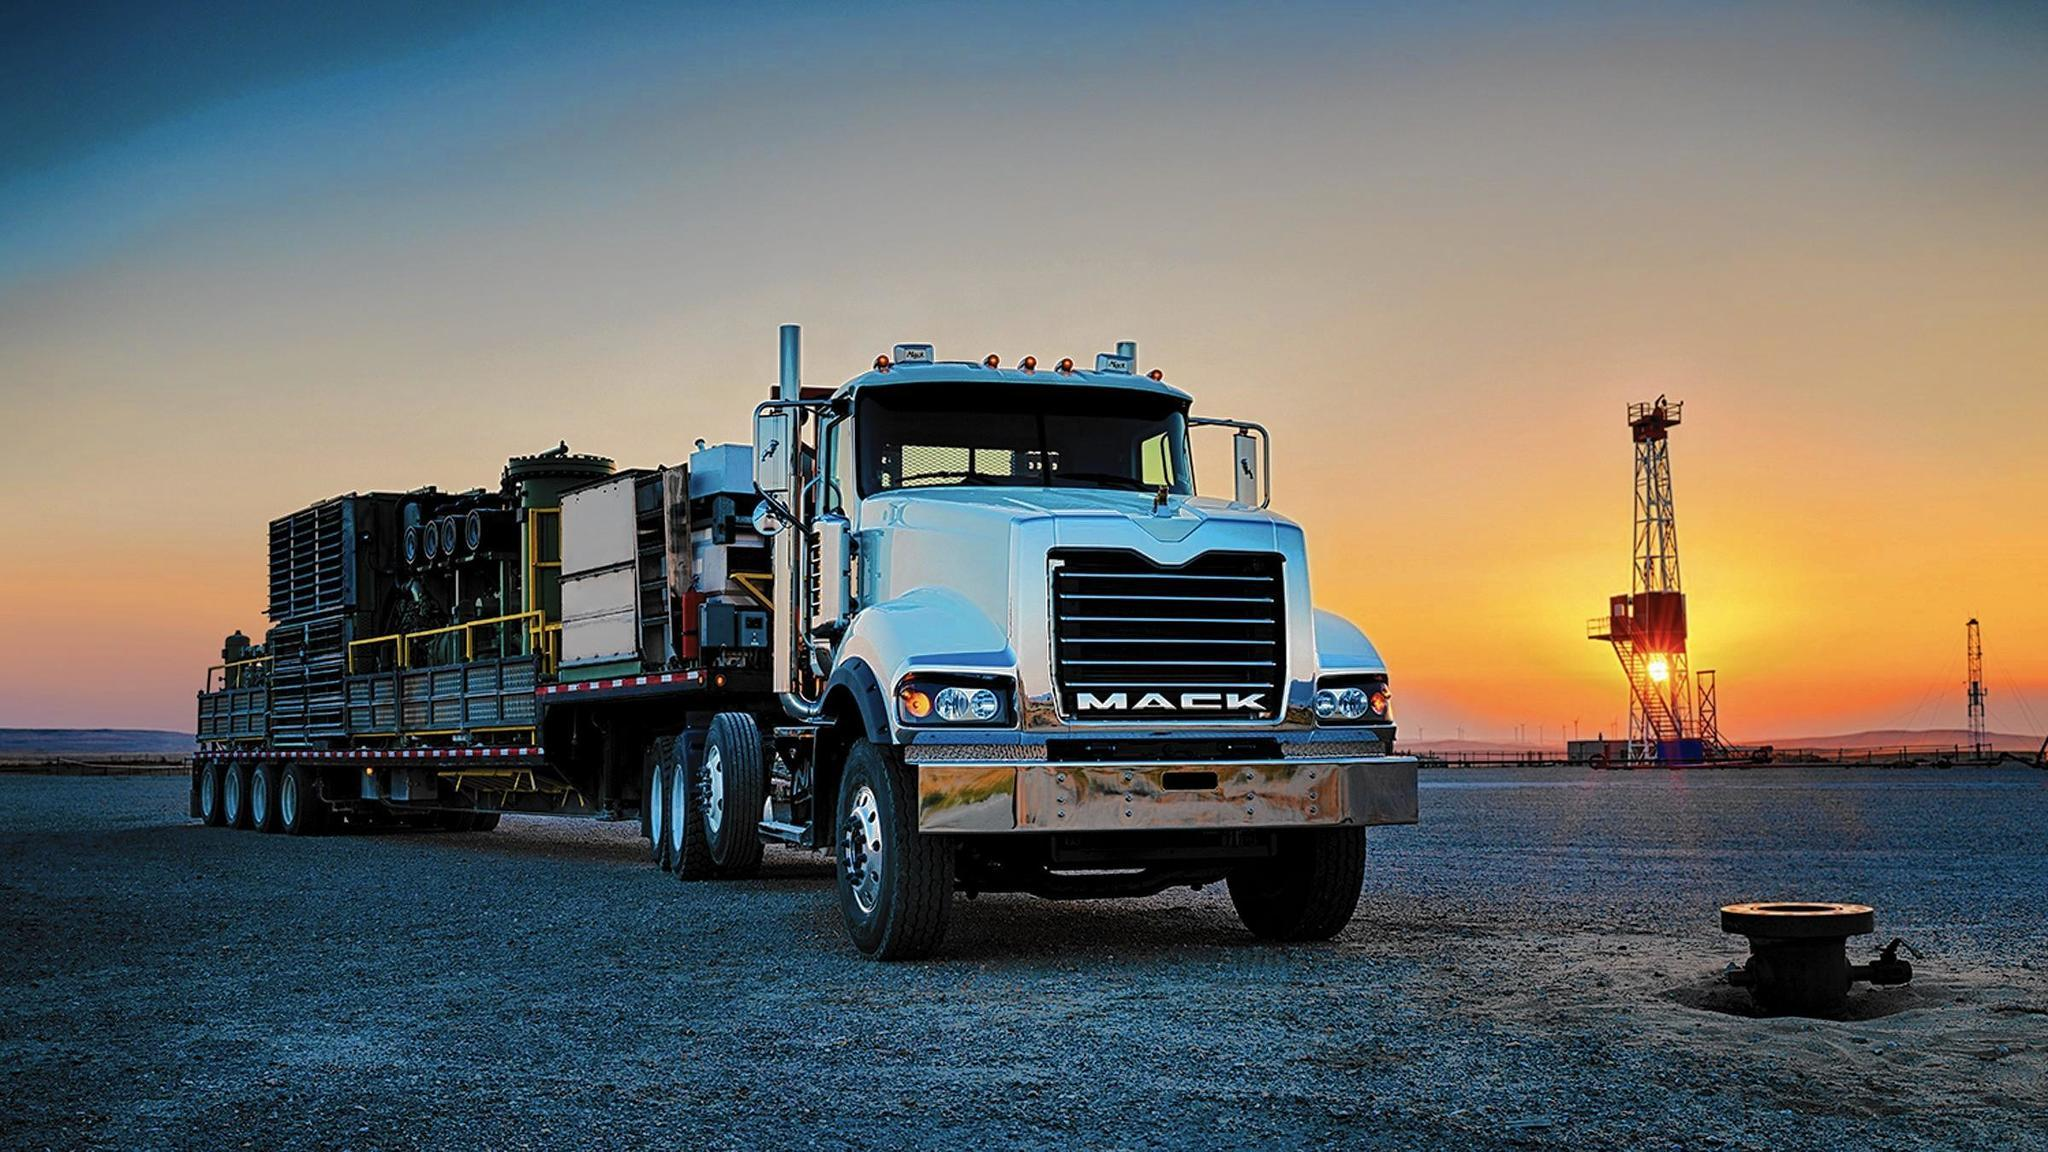 Mack Trucks discontinues    Titan    model  16liter    engine